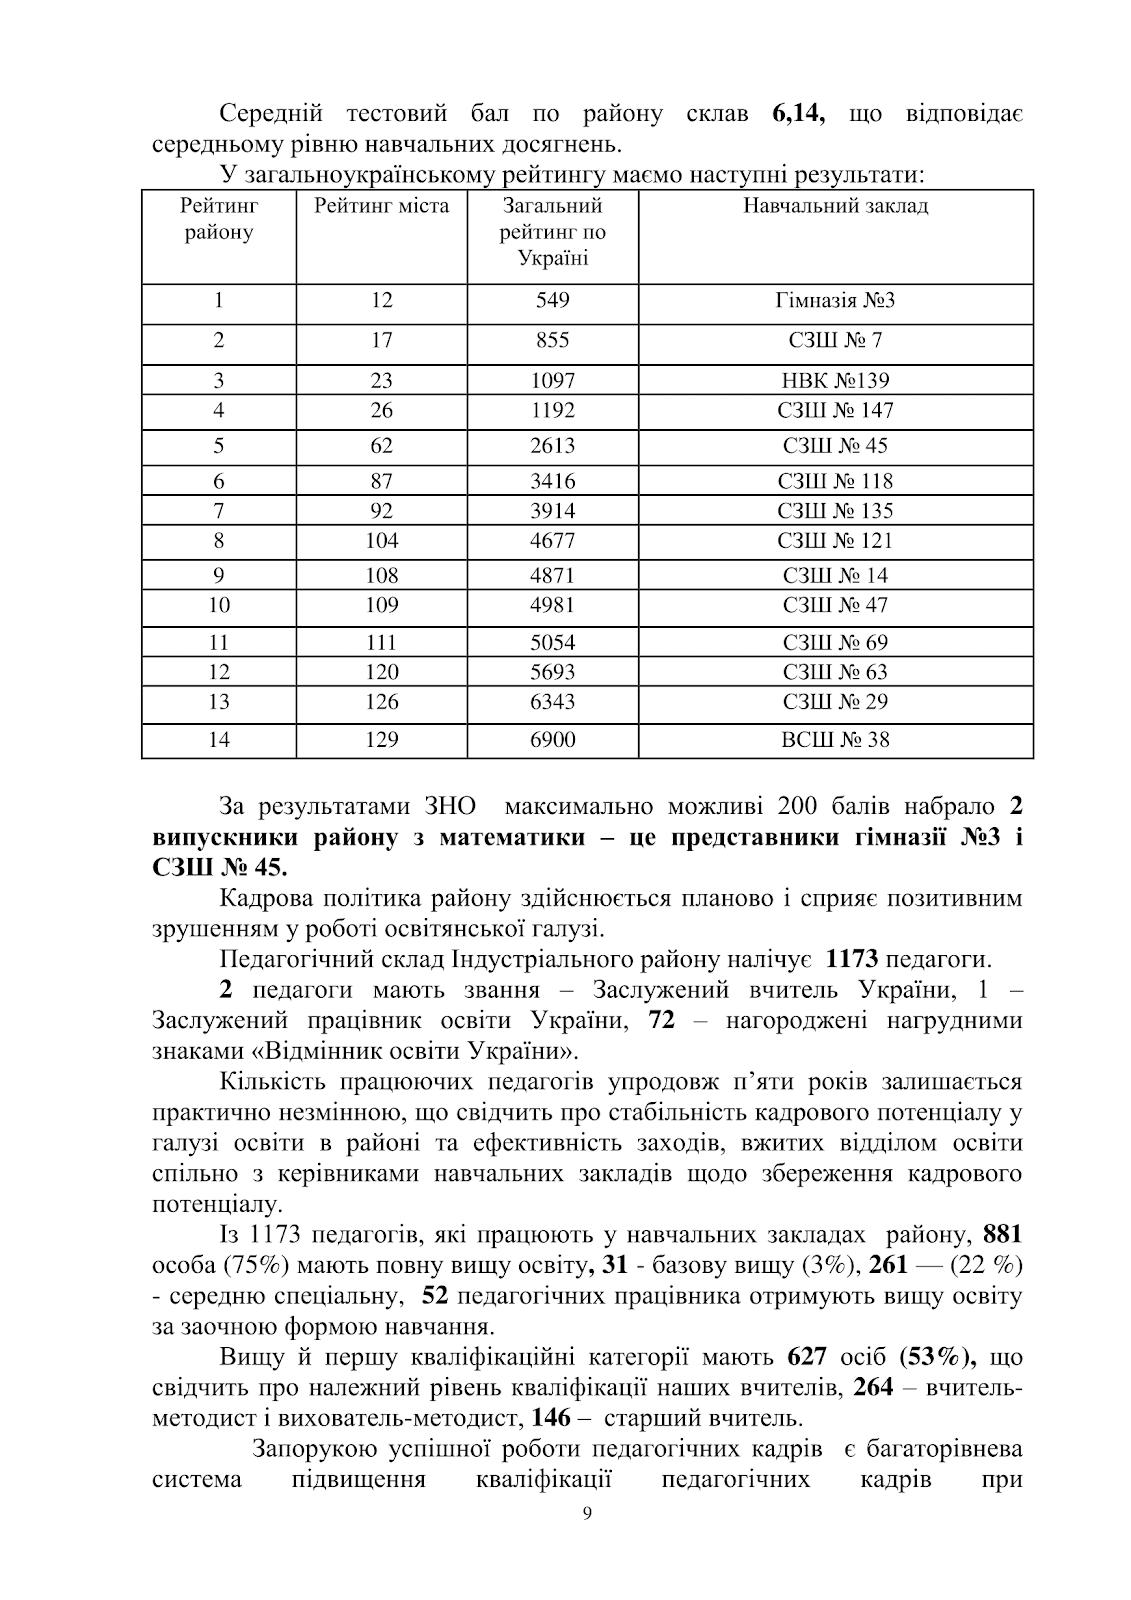 C:\Users\Валерия\Desktop\план 2016 рік\план 2016 рік-009.png